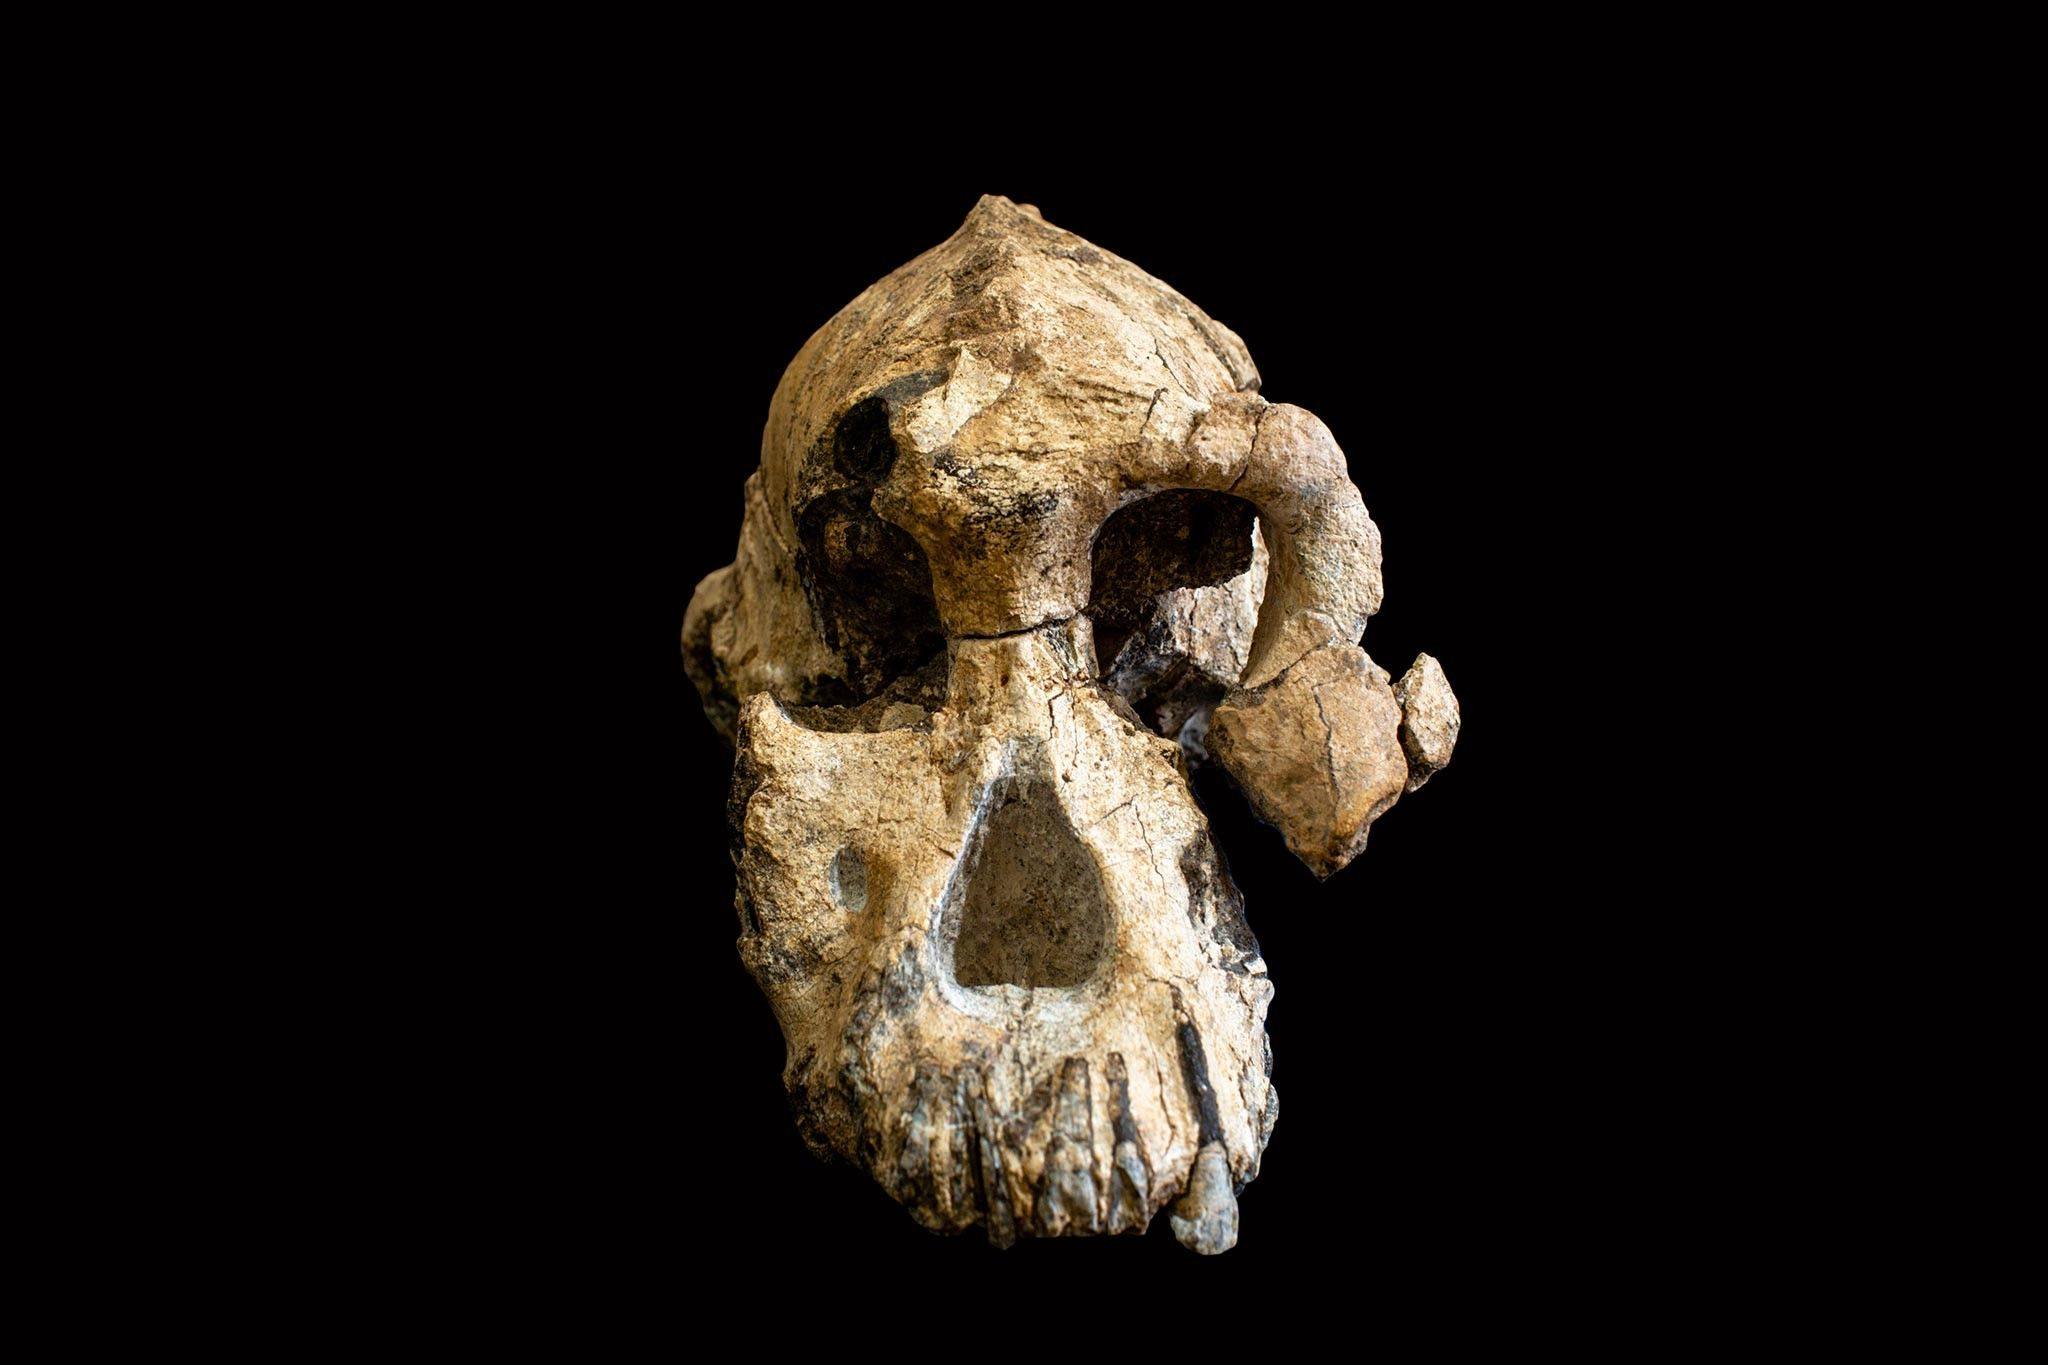 'Unprecedented' skull reveals face of human ancestor | National Geographic